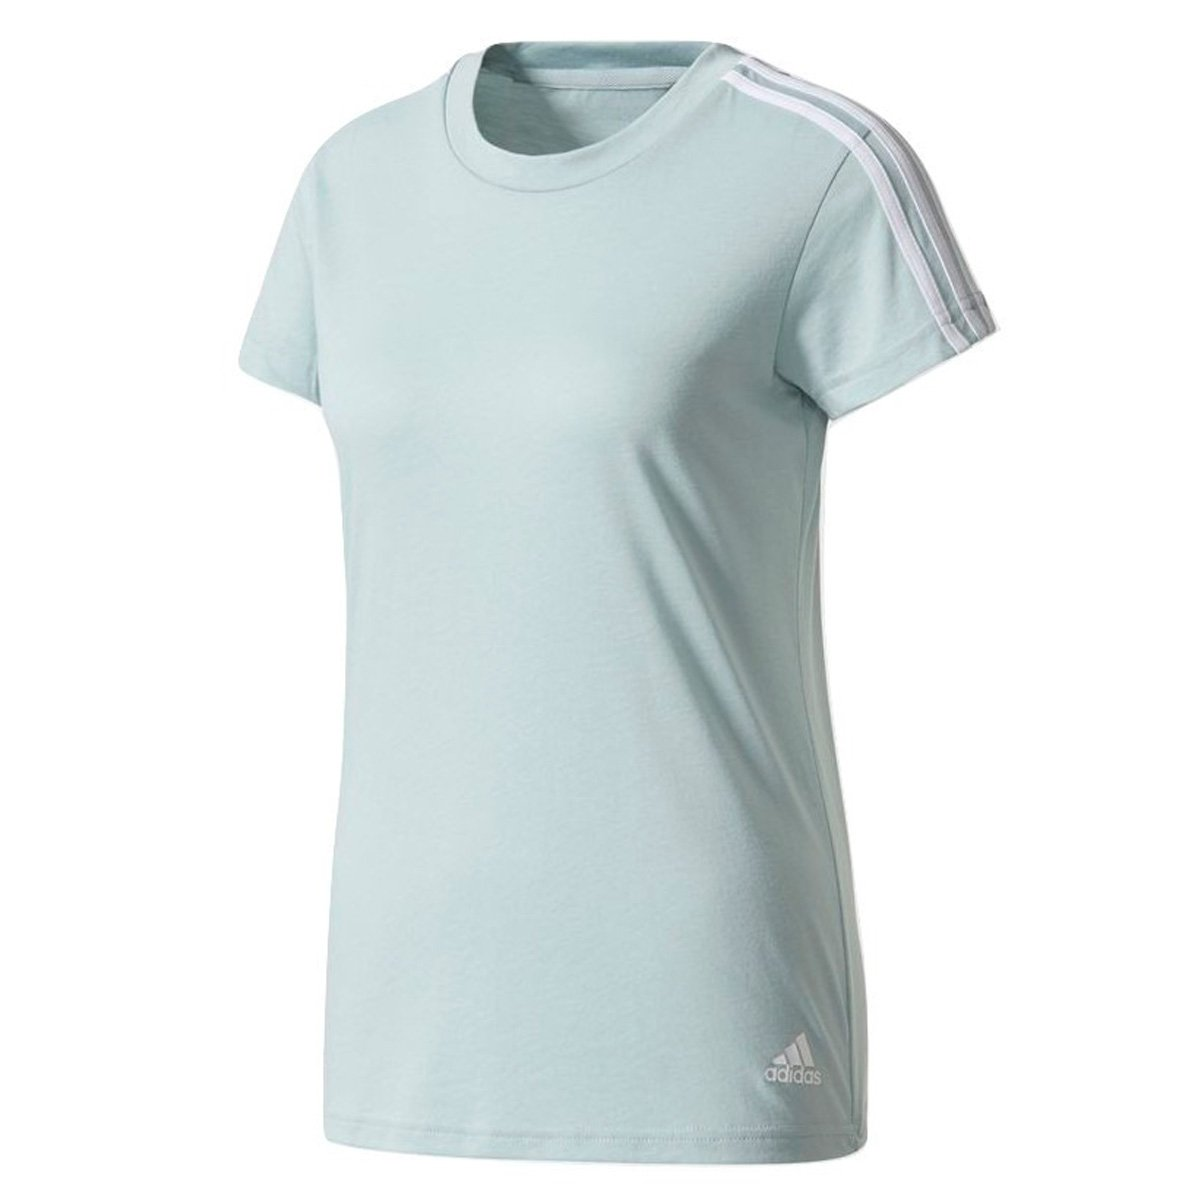 Camiseta Adidas Essentials 3 Stripes Feminina  bd5d745a8f1